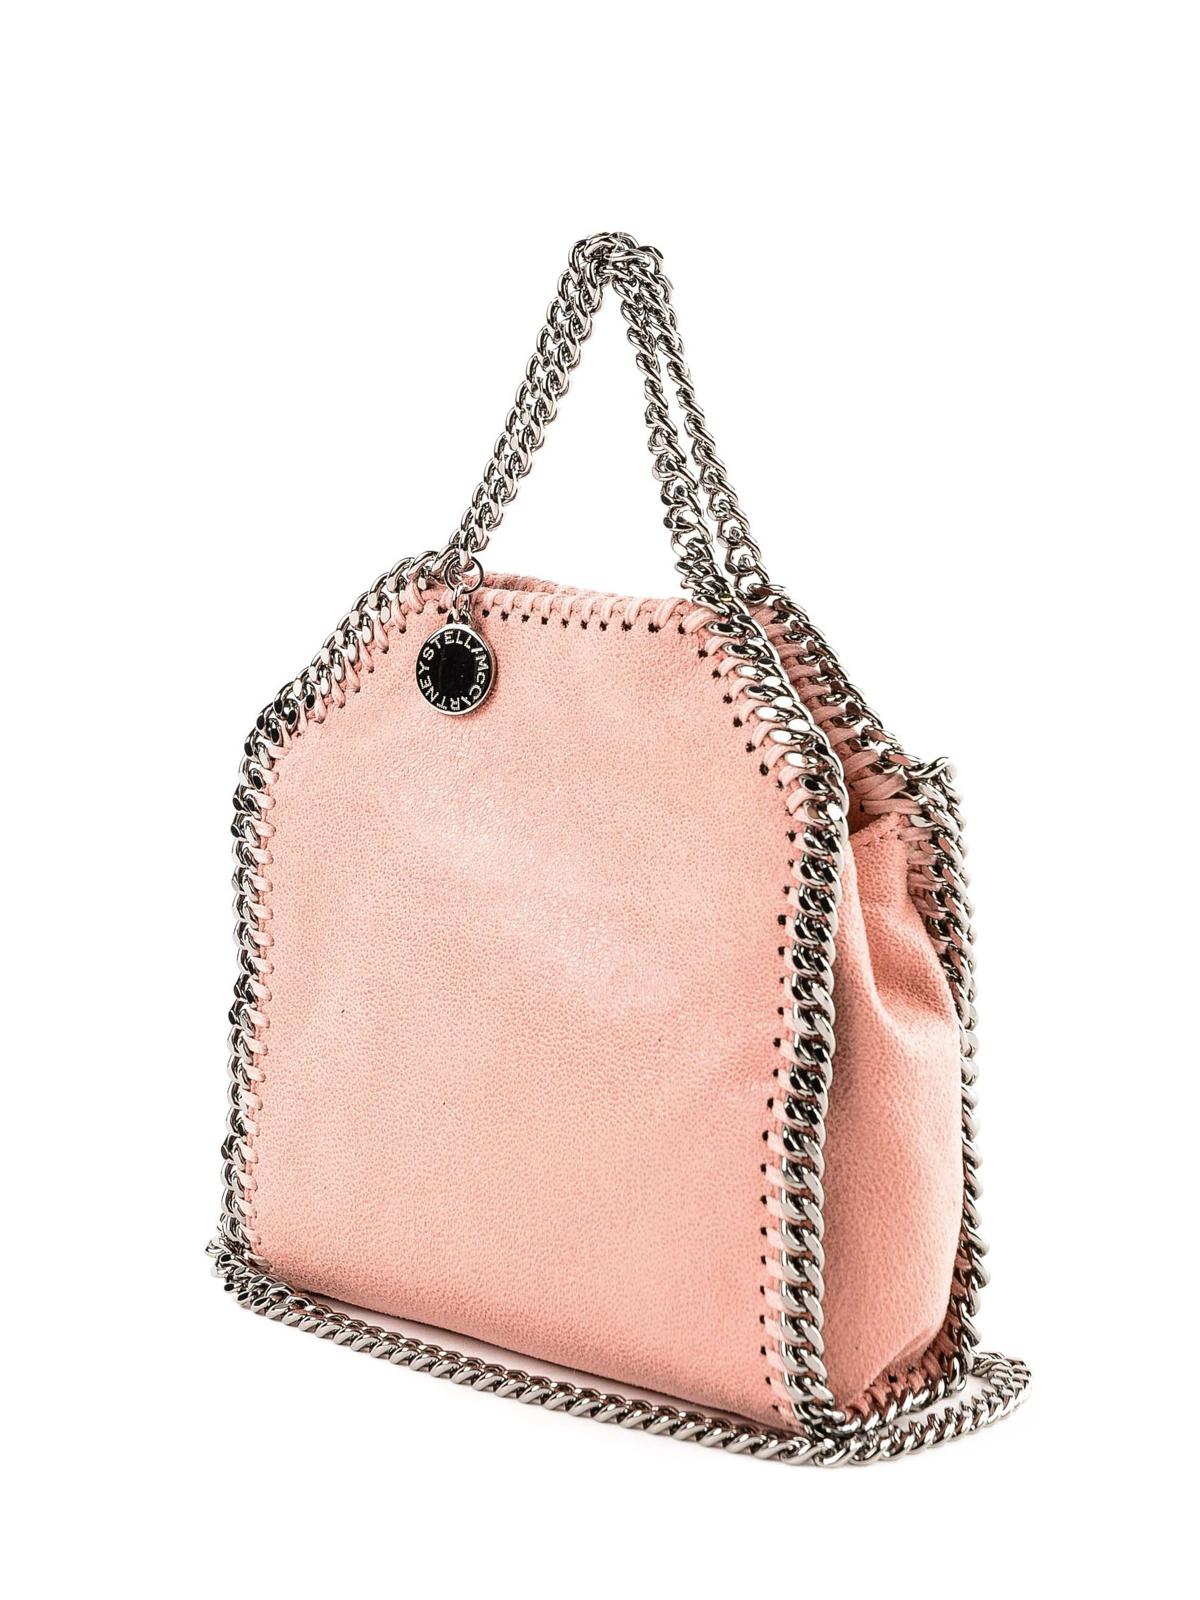 49ef411216114 STELLA McCARTNEY  totes bags online - Pink Tiny Falabella bag